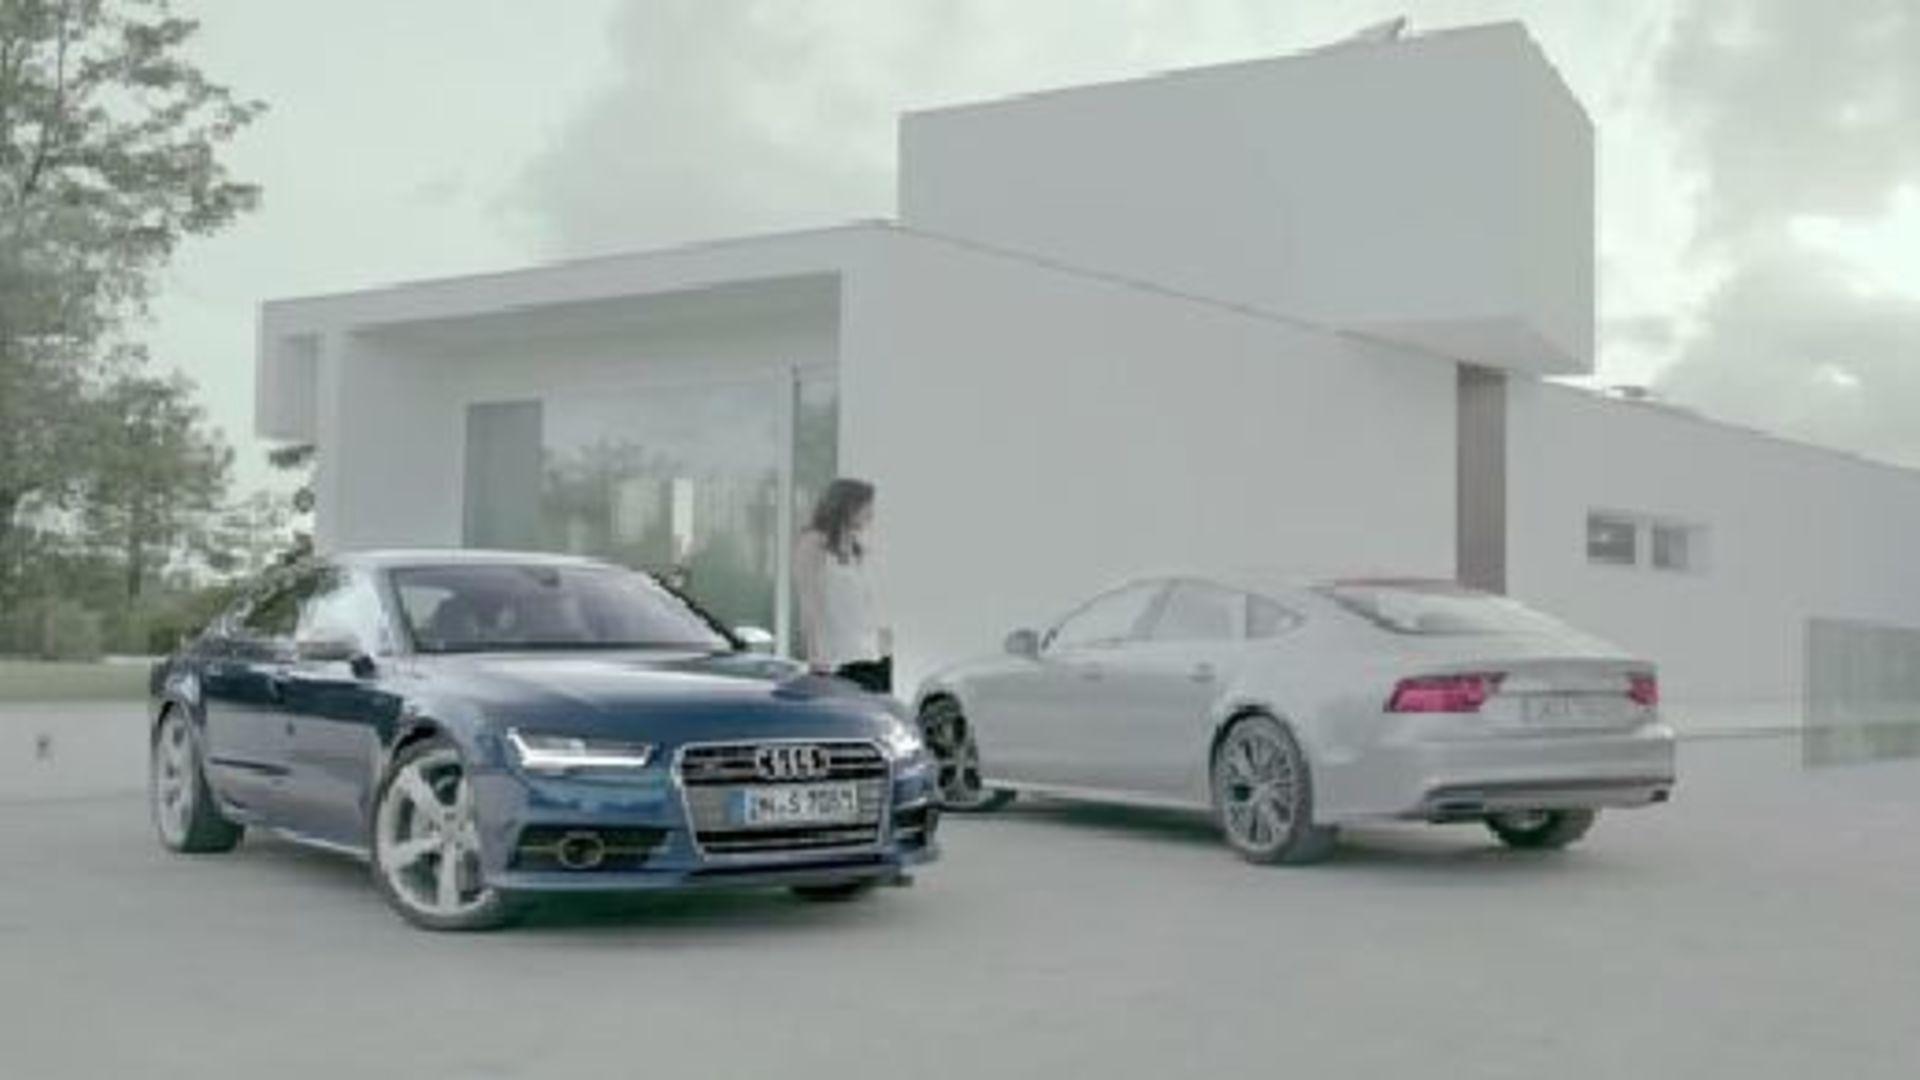 Audi A7 Sportback and Audi S7 Sportback